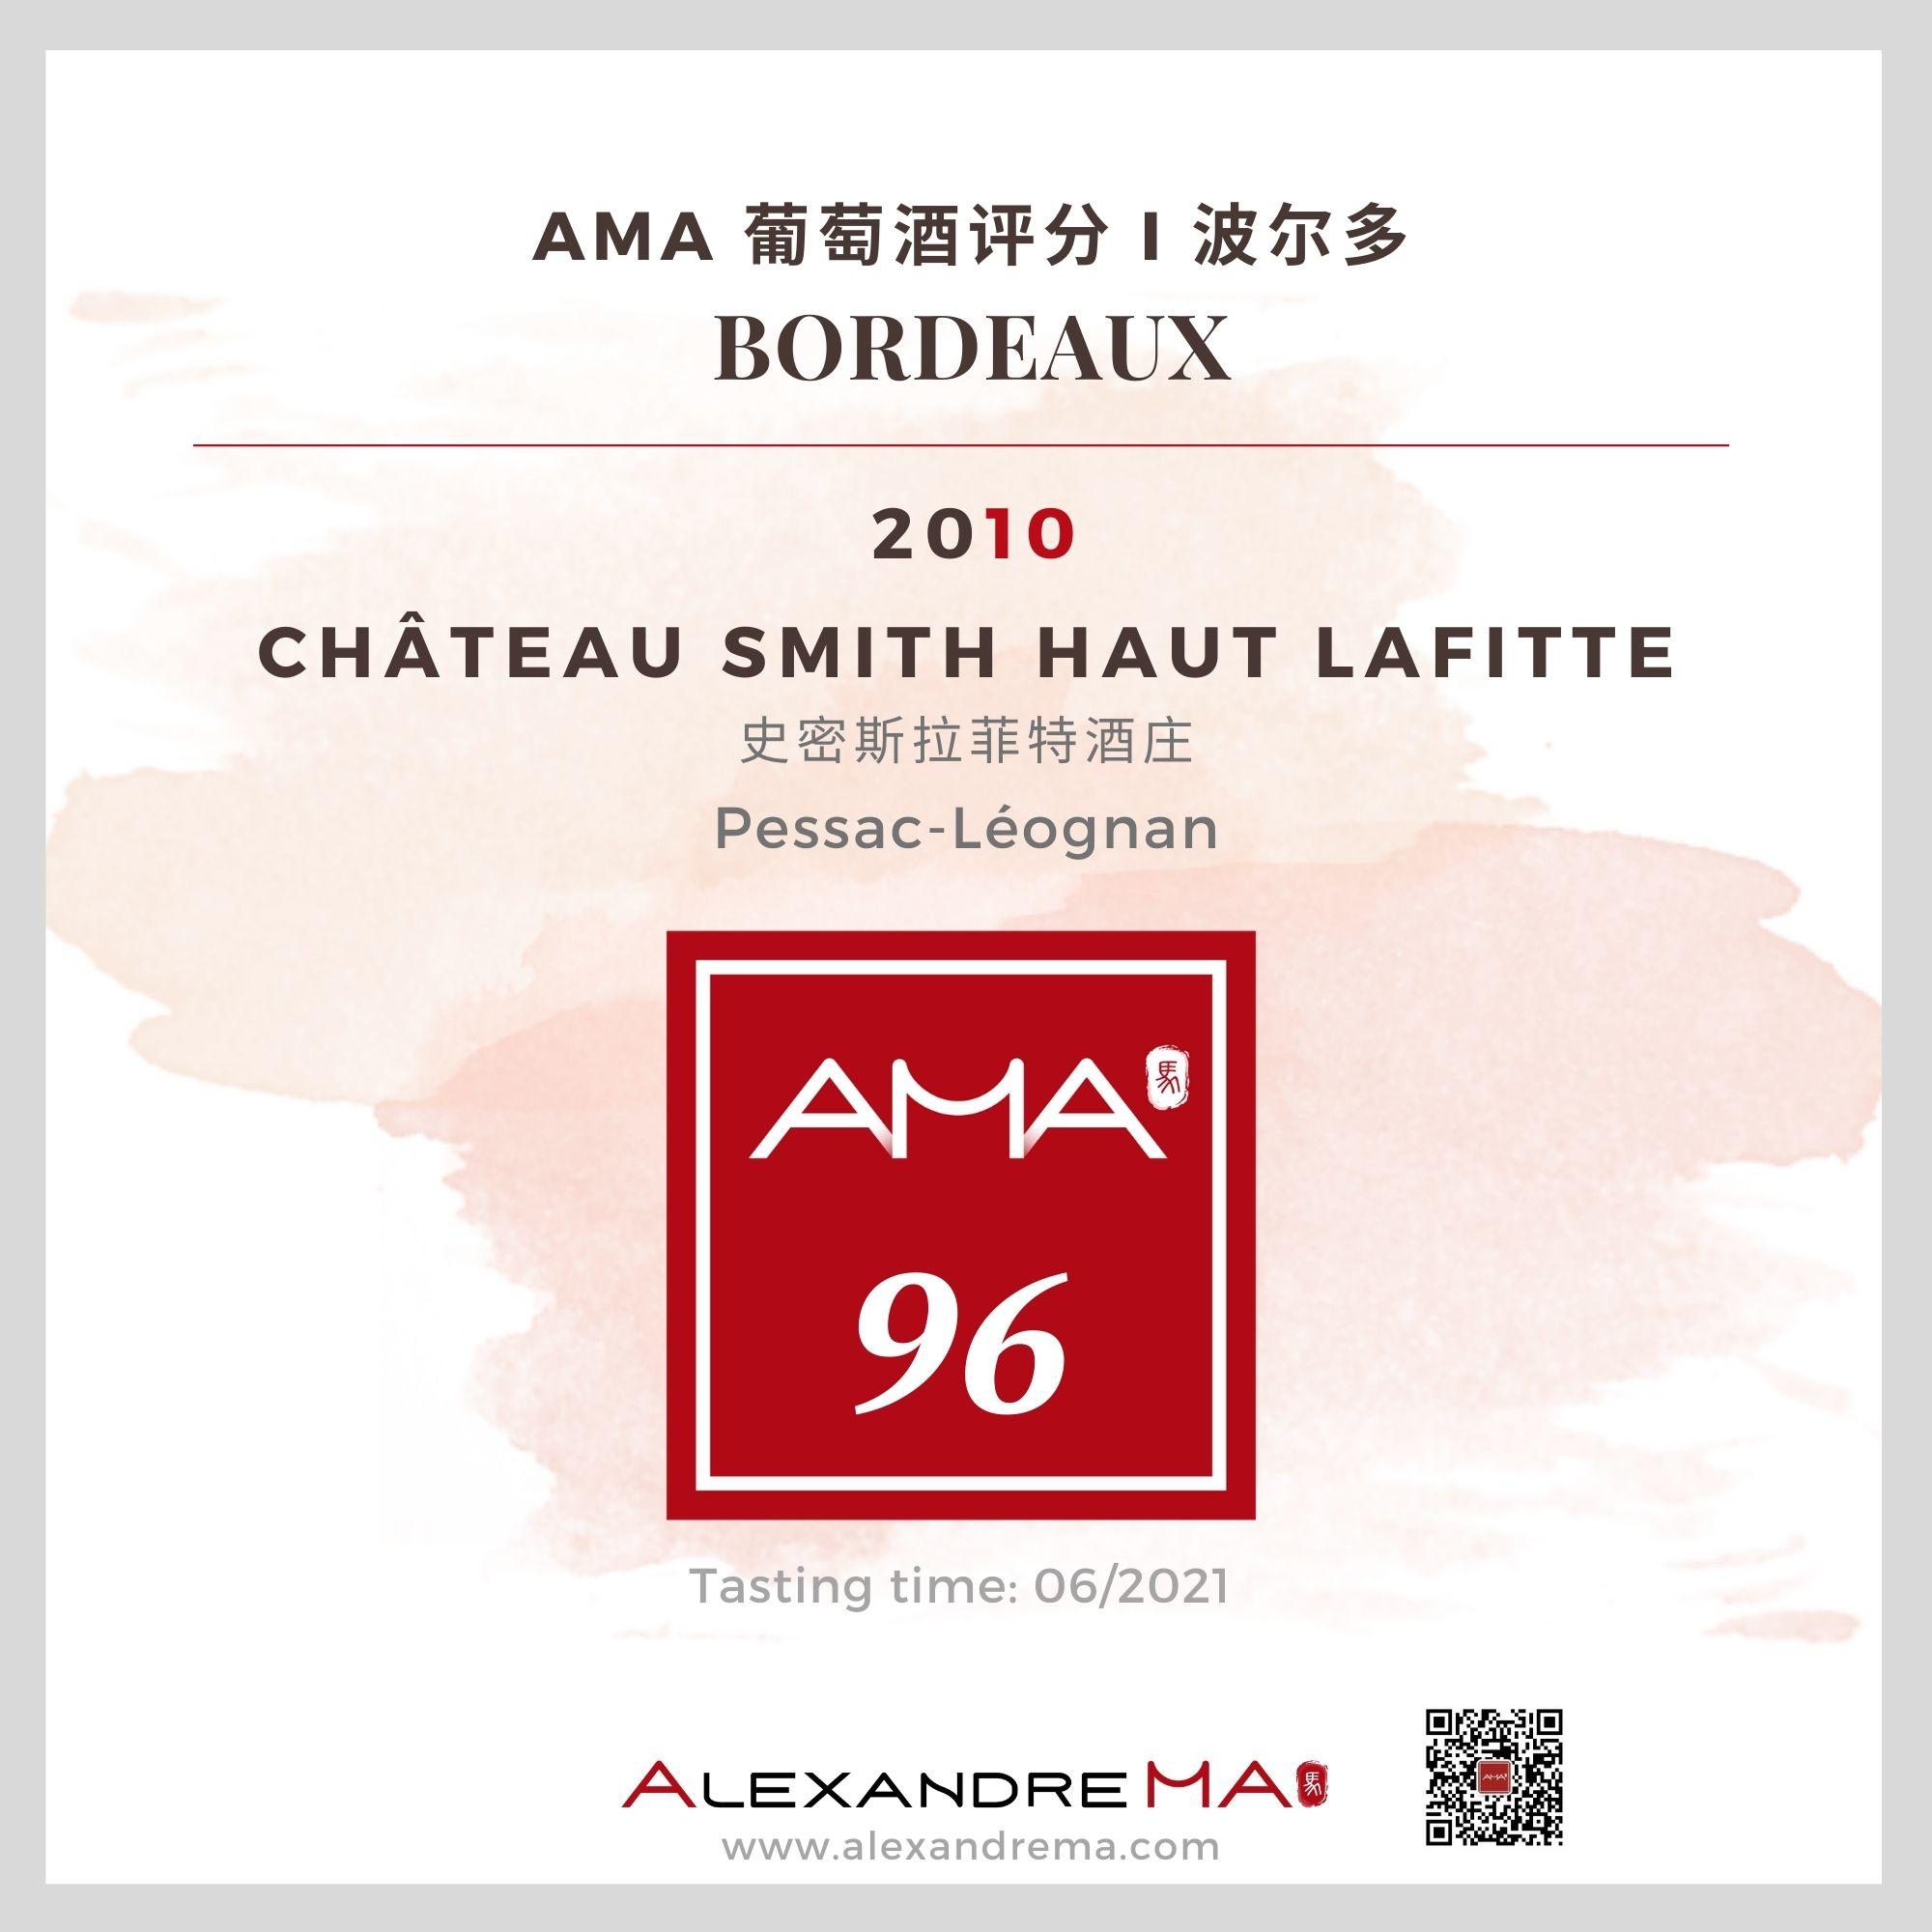 Château Smith Haut Lafitte 2010 史密斯拉菲特酒庄 - Alexandre Ma